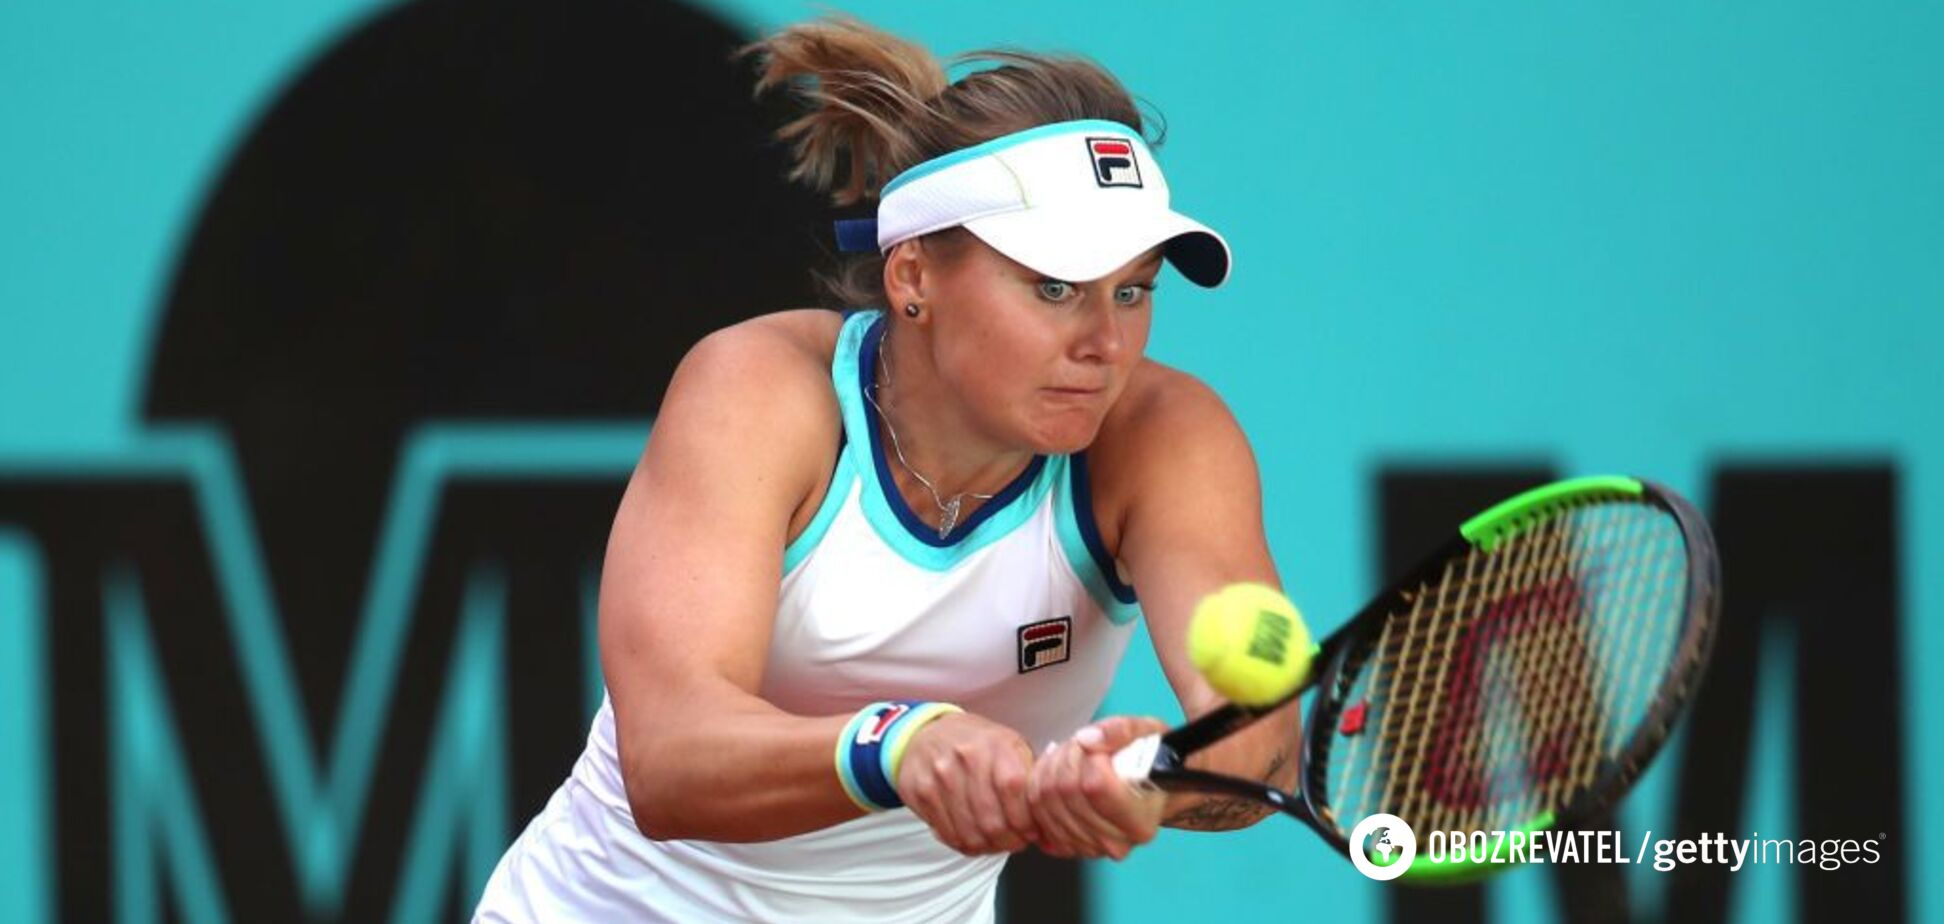 Украинка сотворила громкую сенсацию на теннисном супертурнире в Мадриде